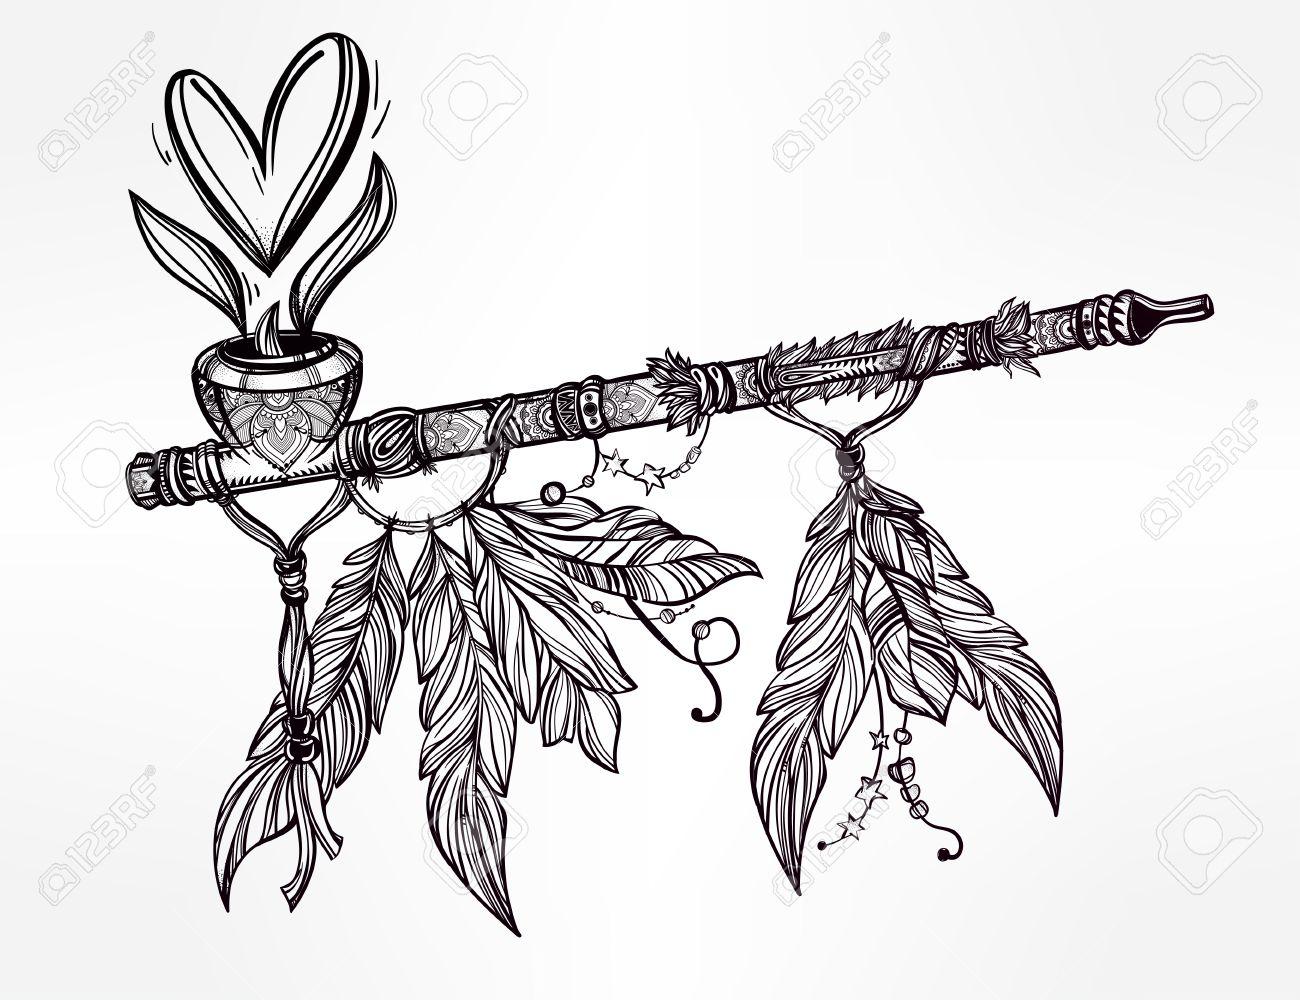 1300x1000 Hand Drawn Beautiful Artwork Of Traditional Indian Smoking Pipe